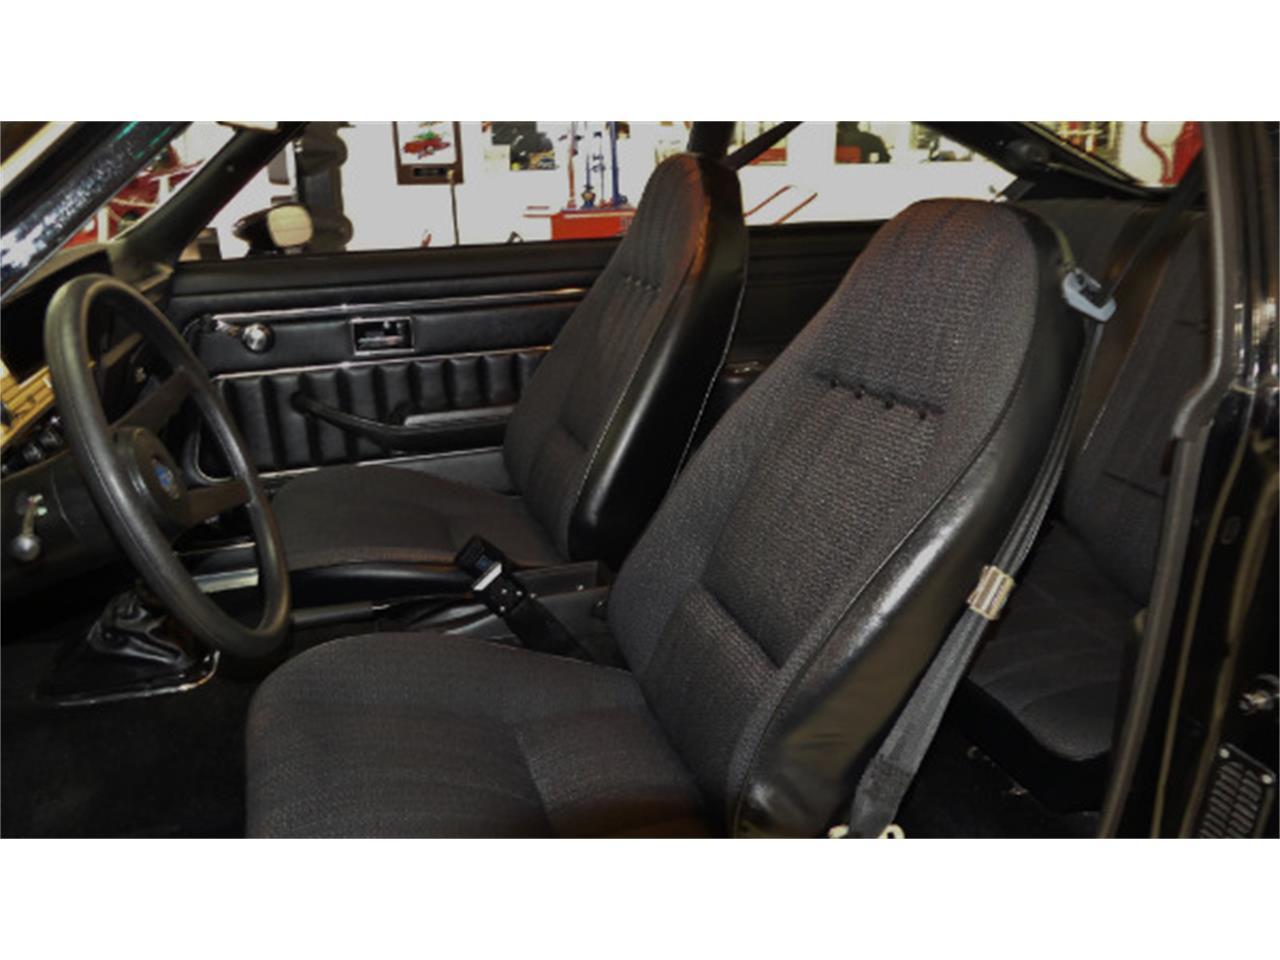 Large Picture of '75 Chevrolet Vega located in Columbus Ohio Offered by Cruisin Classics - L2U8